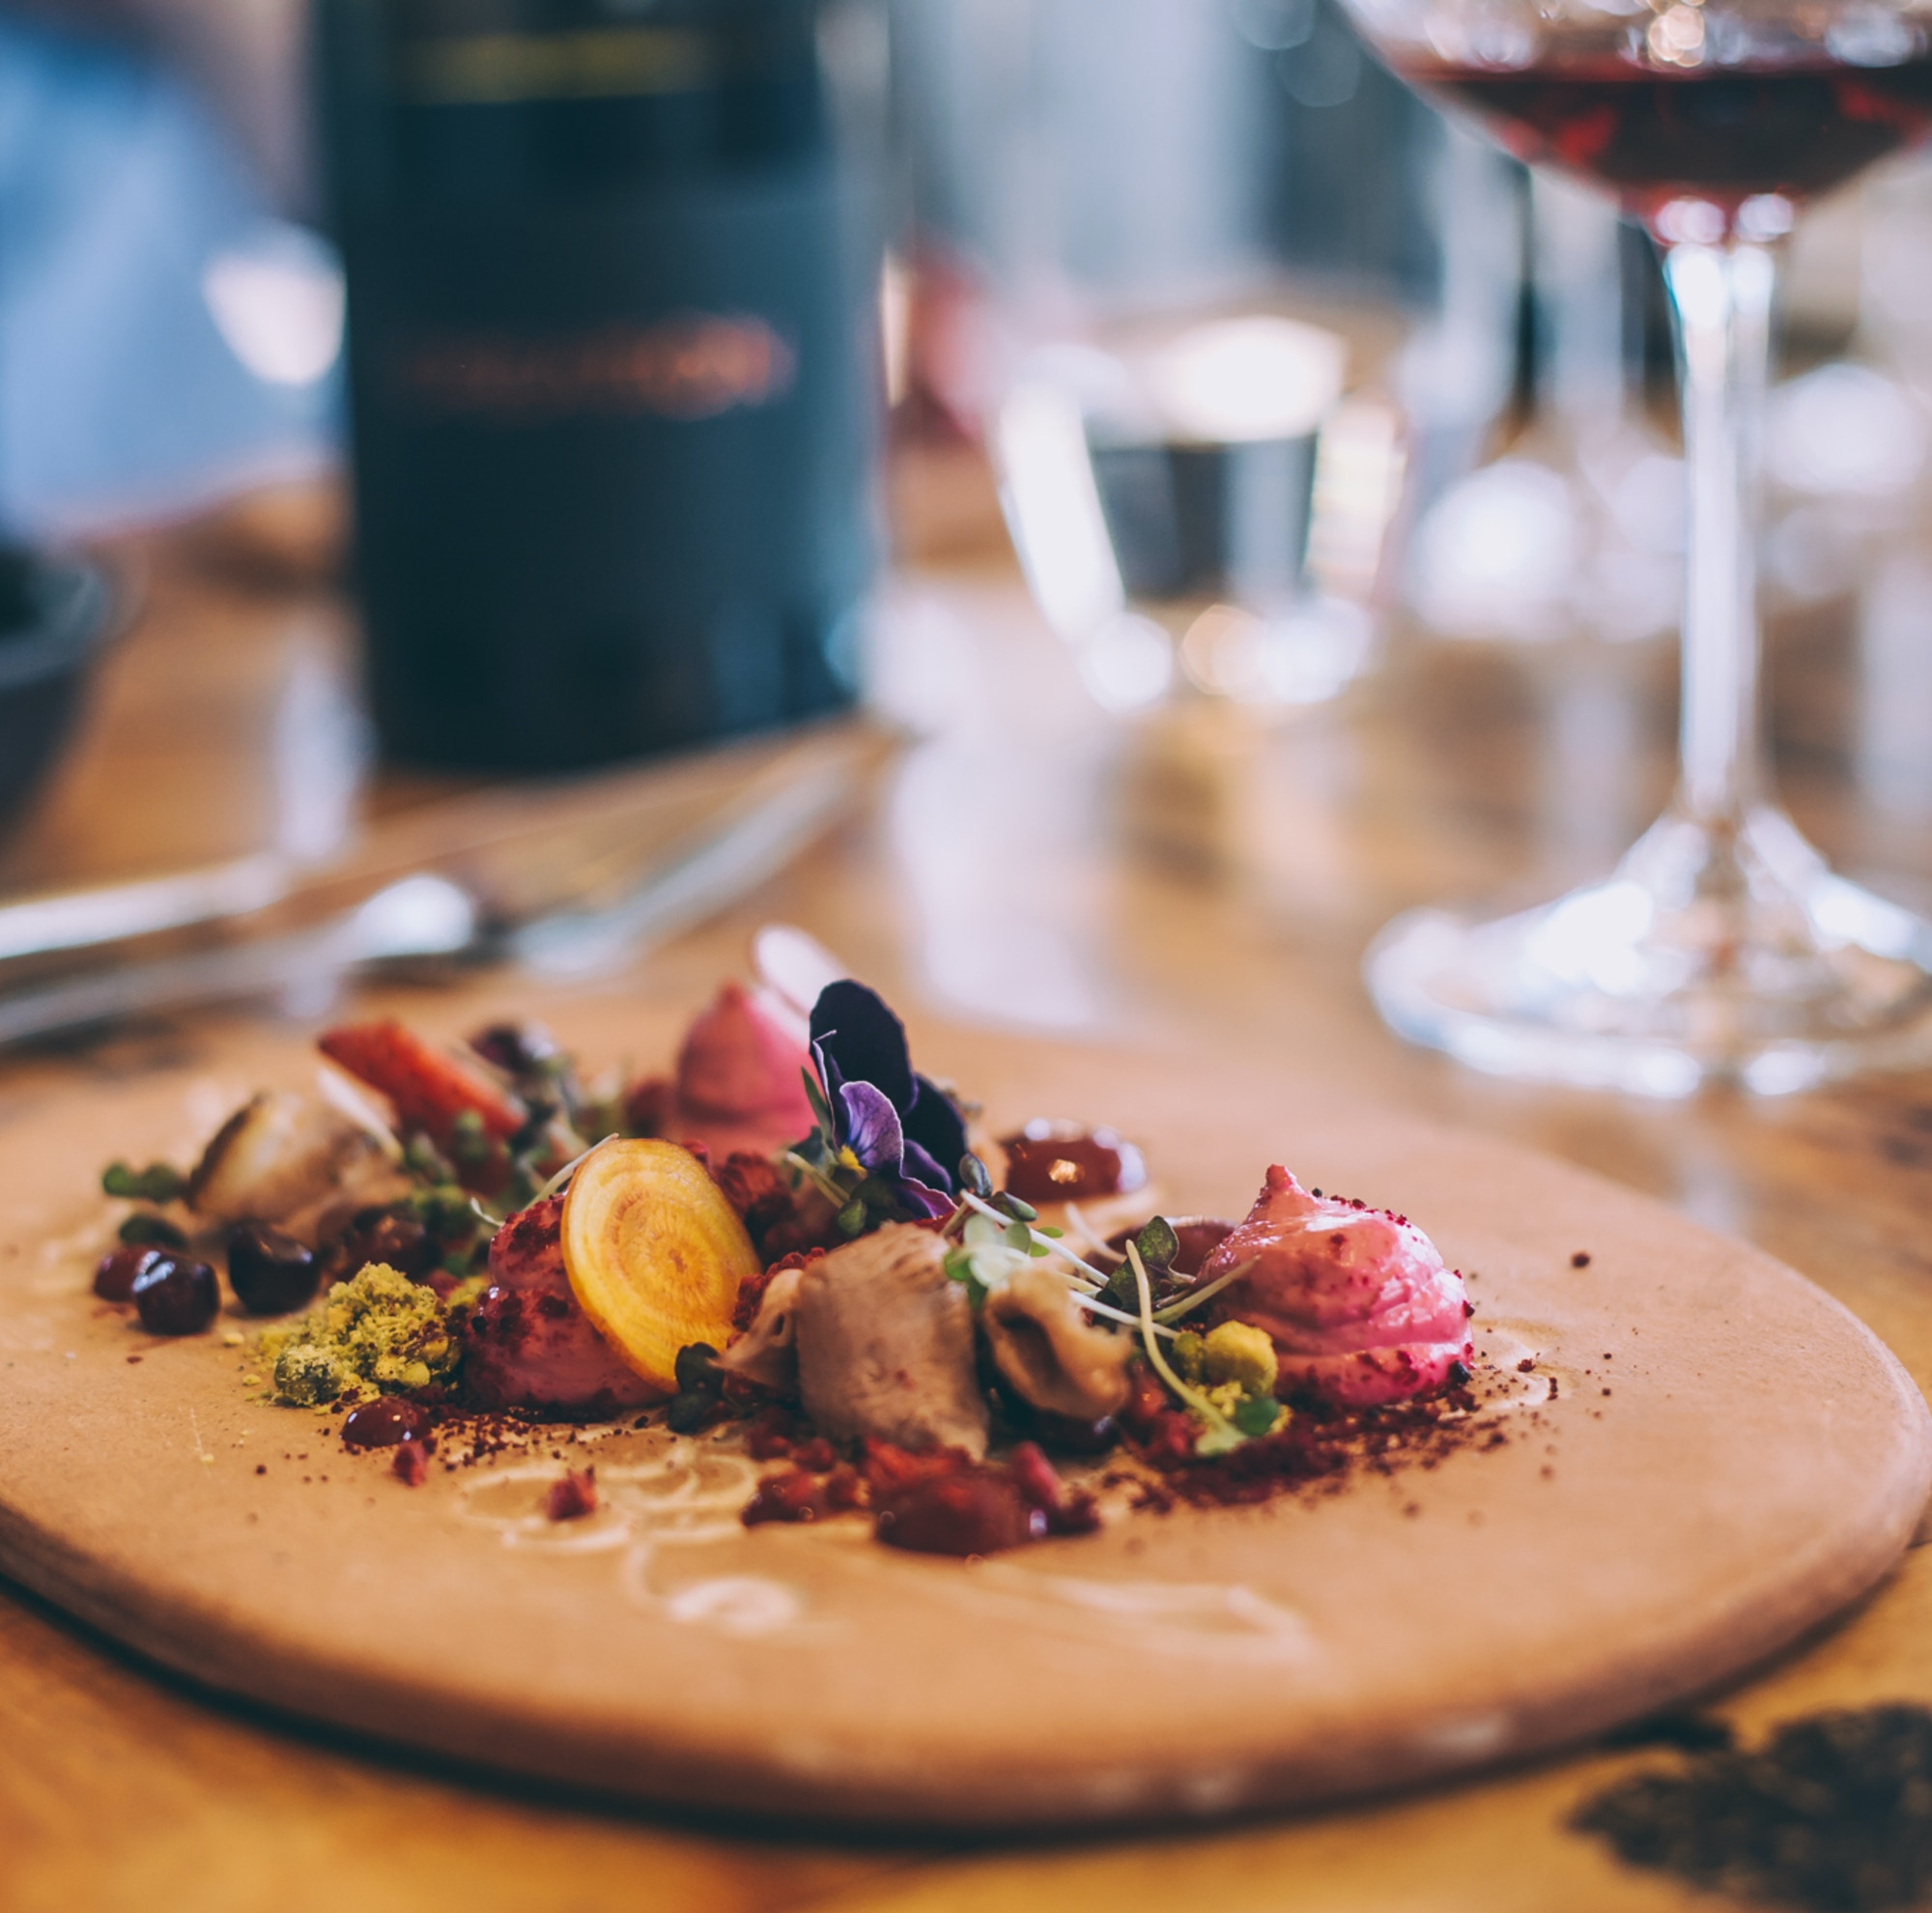 Food and Wine at Creation Wine Estate in Hermanus Image credit Shawn Ugulu